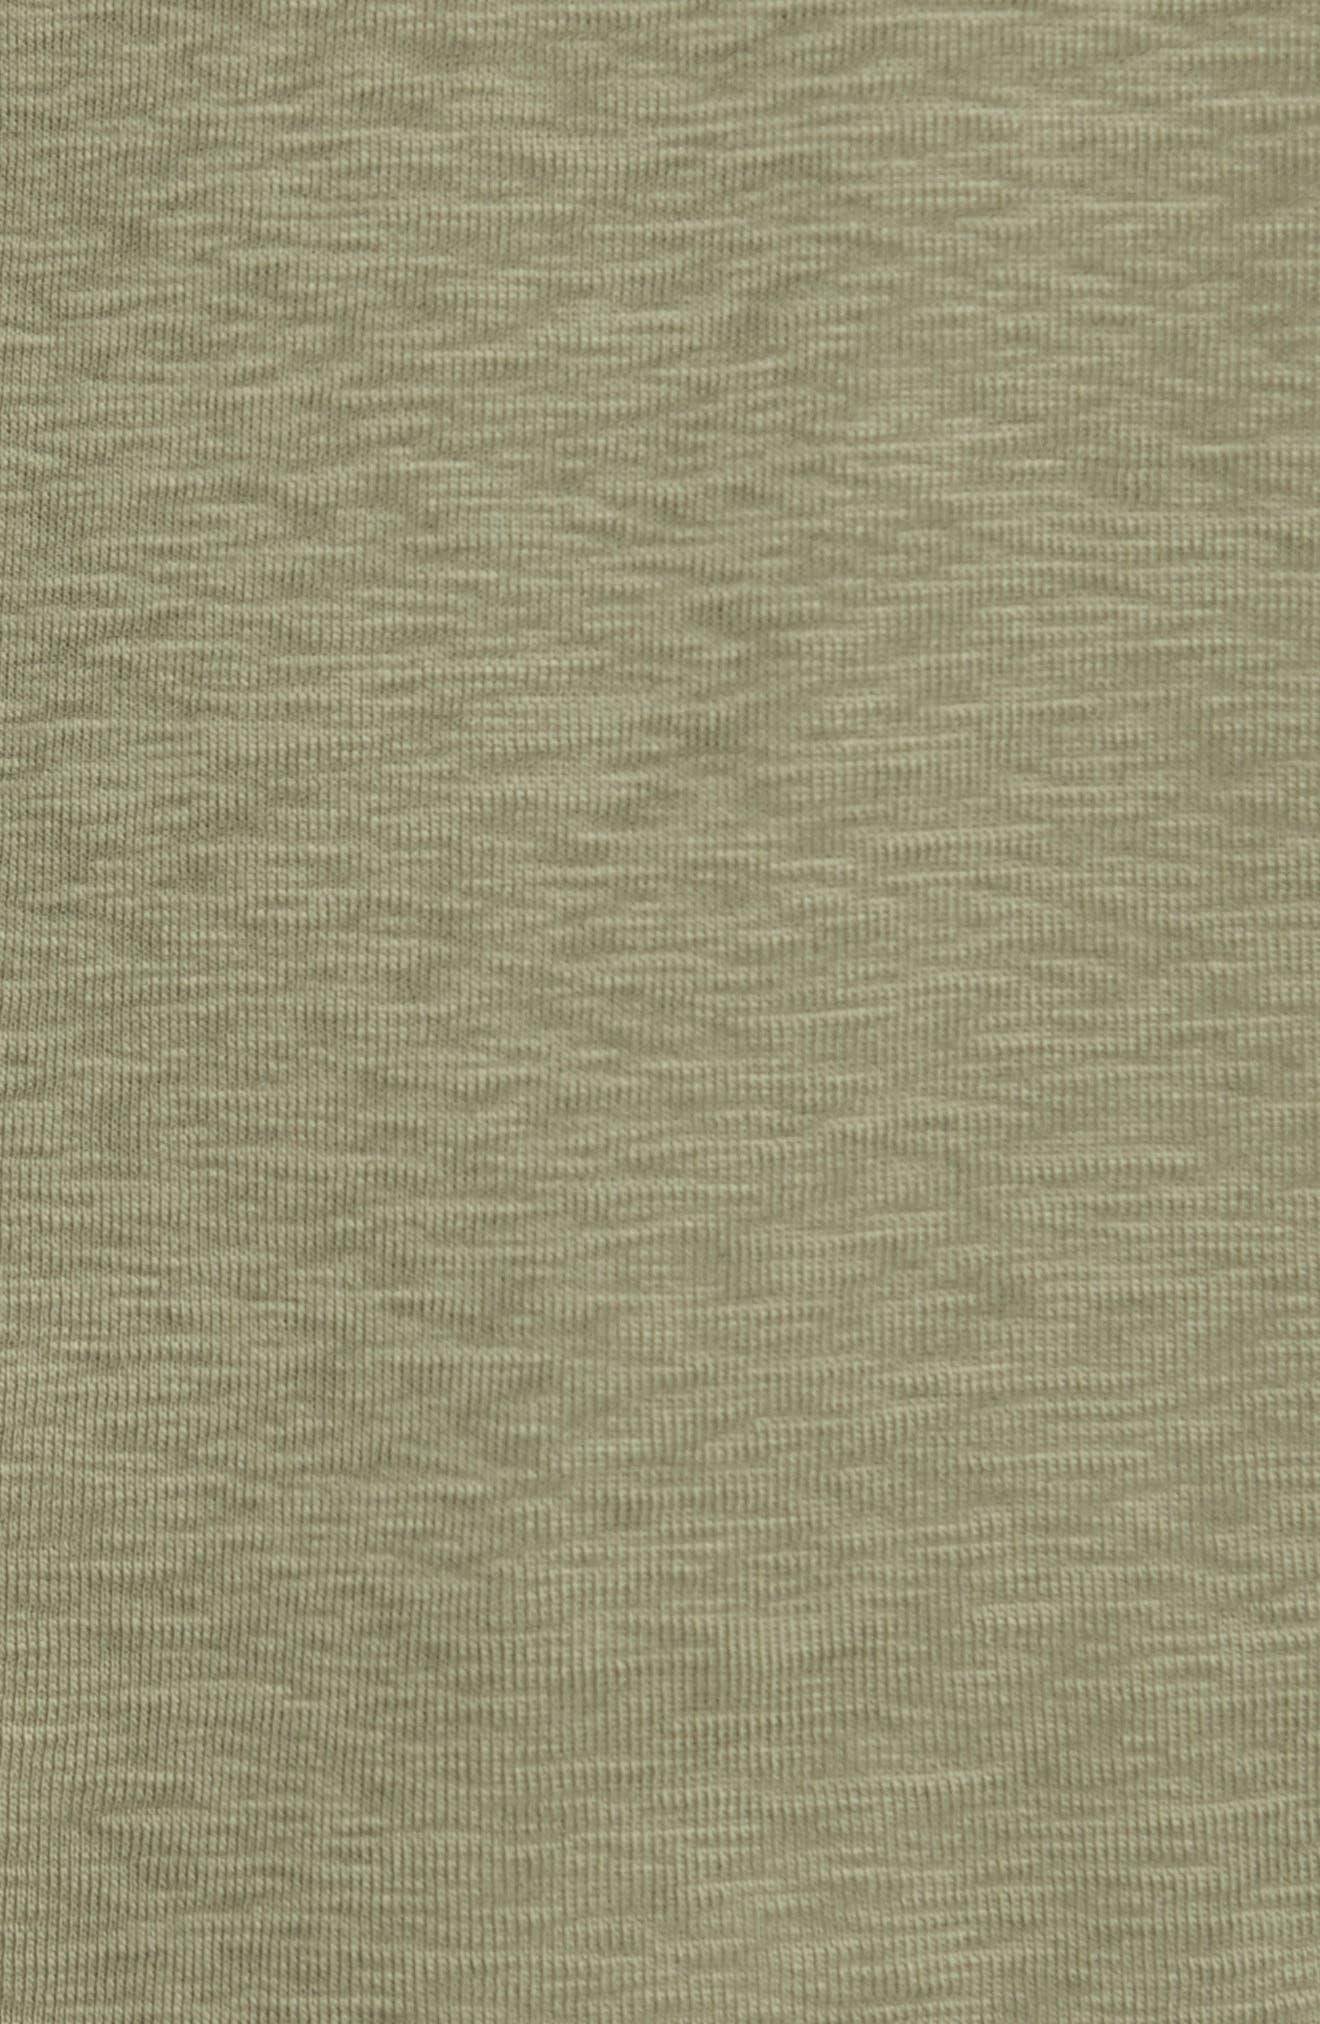 'Base' Short Sleeve Henley,                             Alternate thumbnail 5, color,                             OLIVE